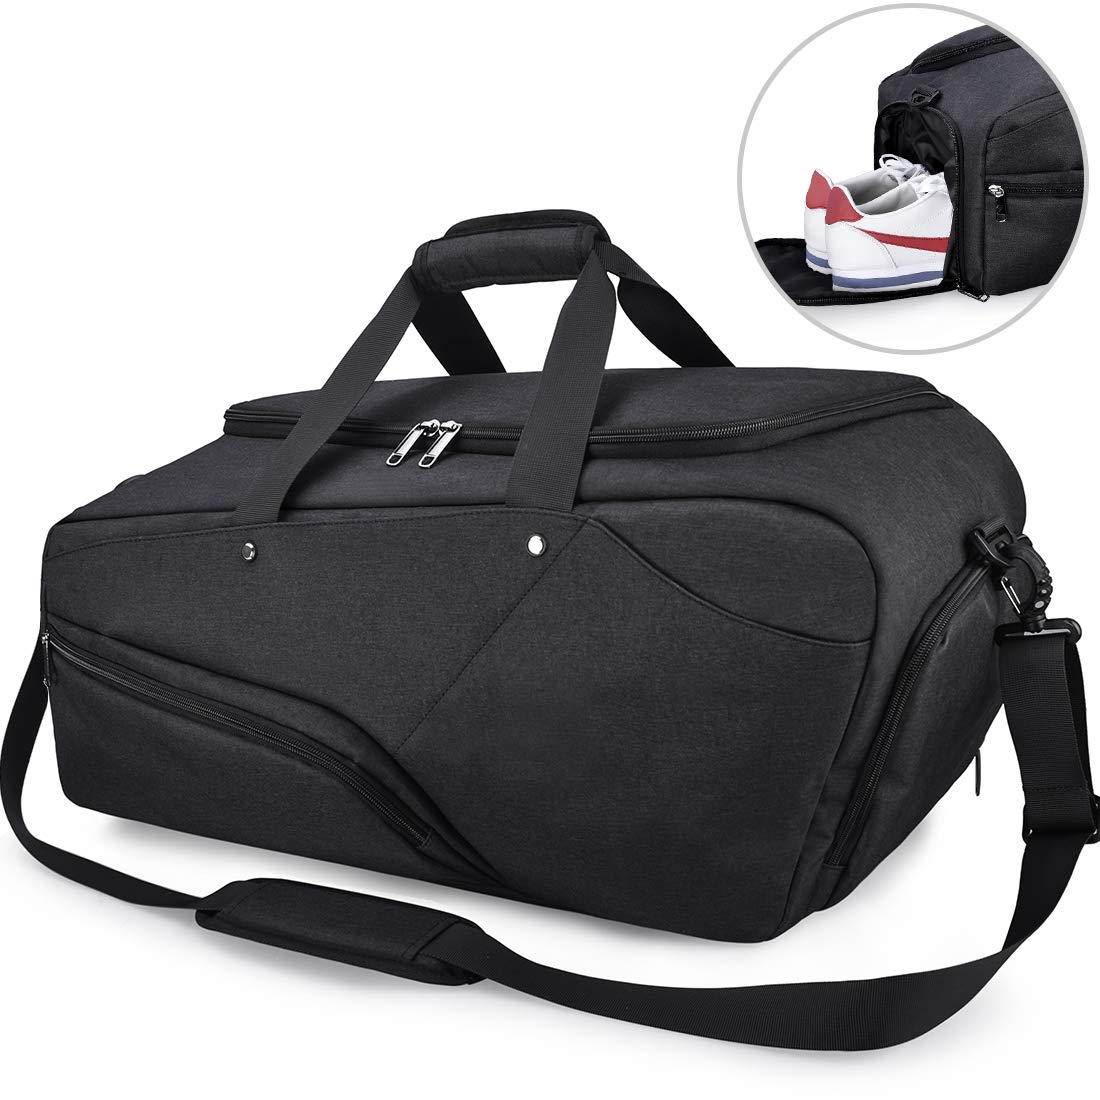 Travel Duffels Unicorn Cool Duffle Bag Luggage Sports Gym for Women /& Men